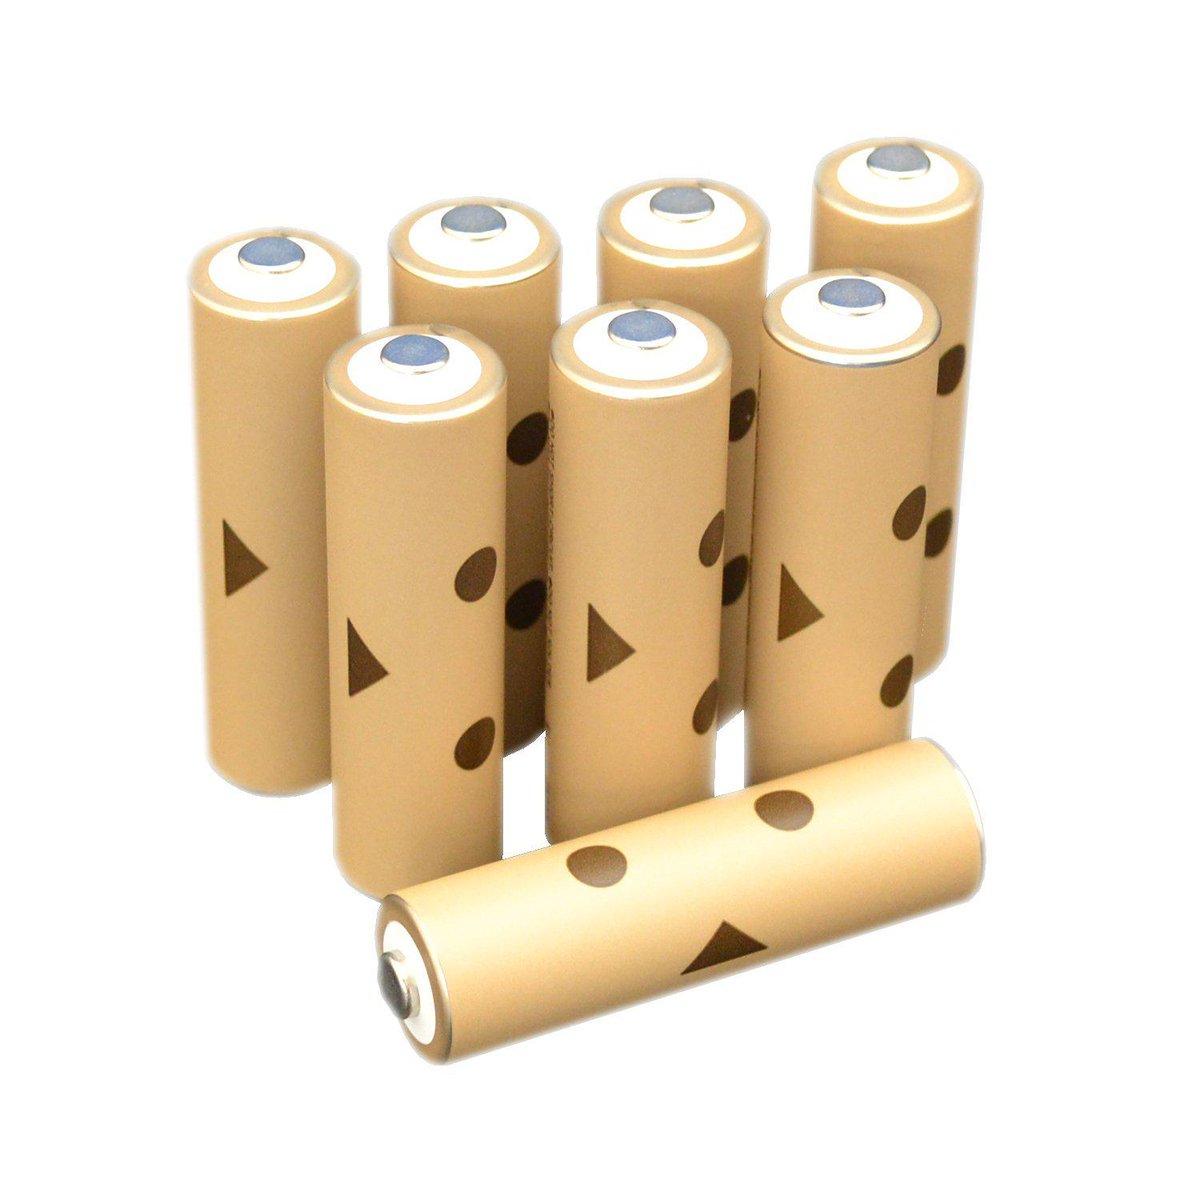 #Sailing推荐您买 Amazon限定 纸盒人 充电电池 日本产 日本正品代购 http://t.co/me5mMQ7gIl http://t.co/1dJbZaS5gm